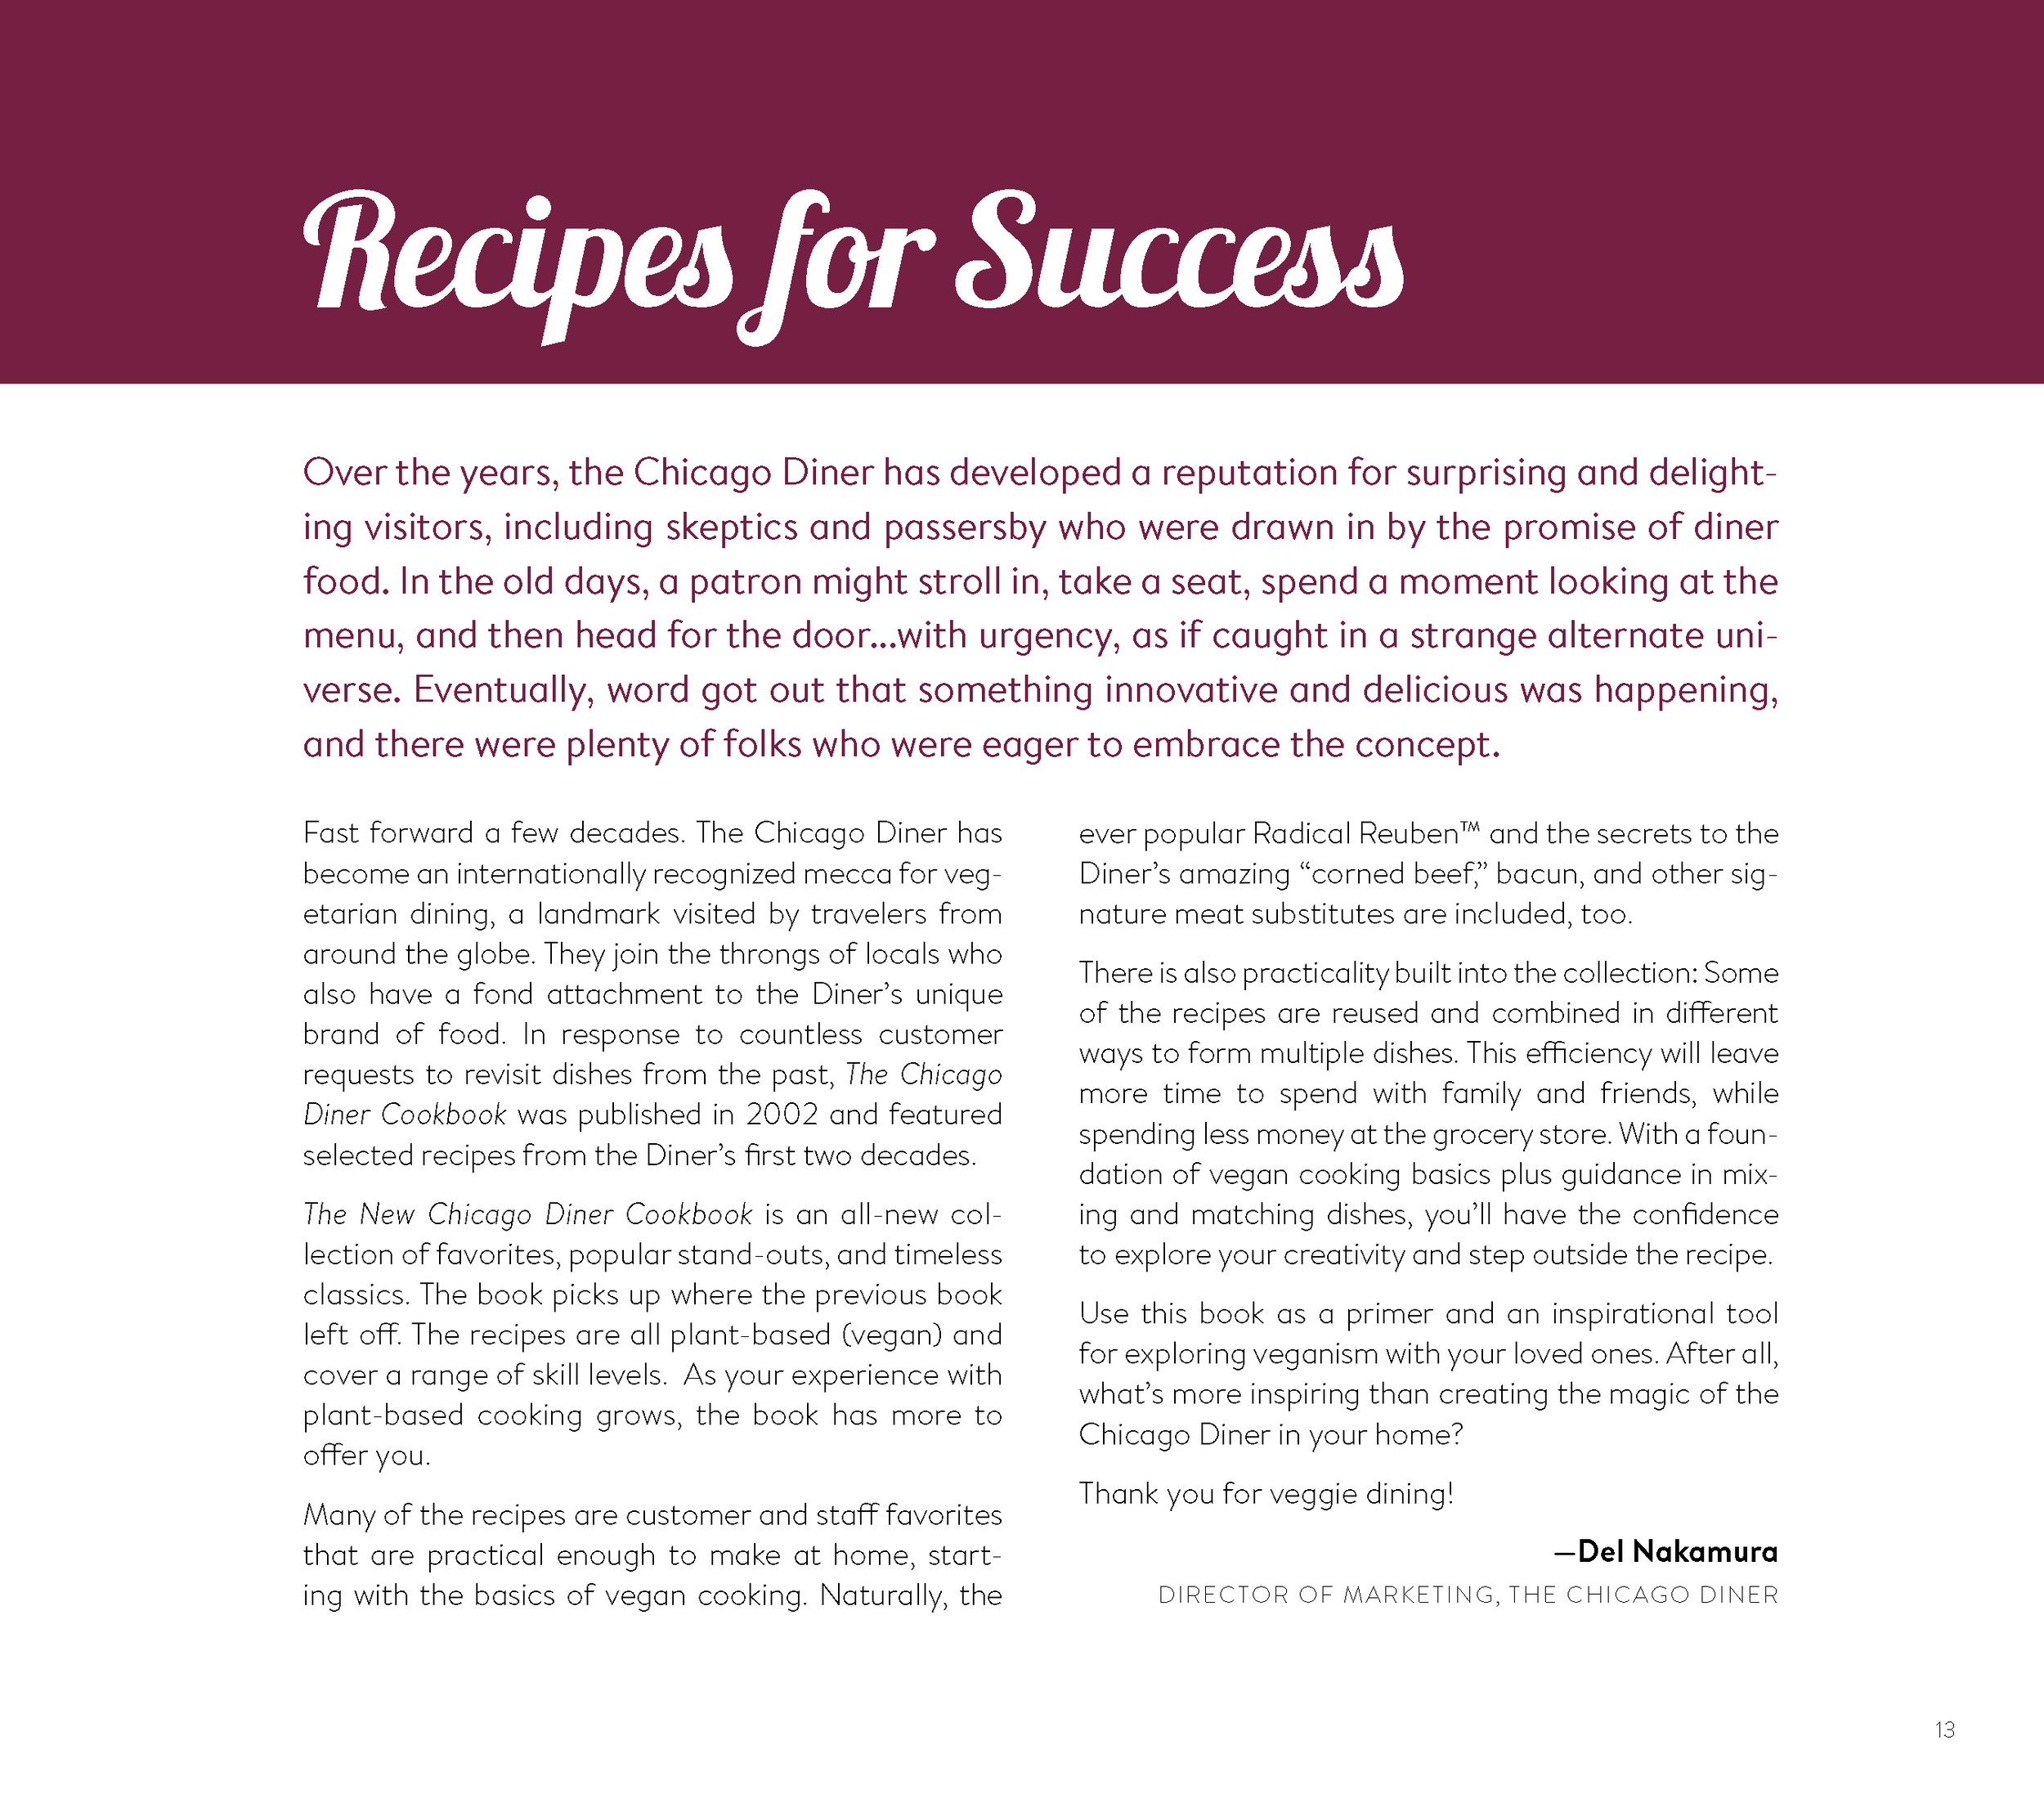 New Chicago Diner Cookbook_Page_03.png